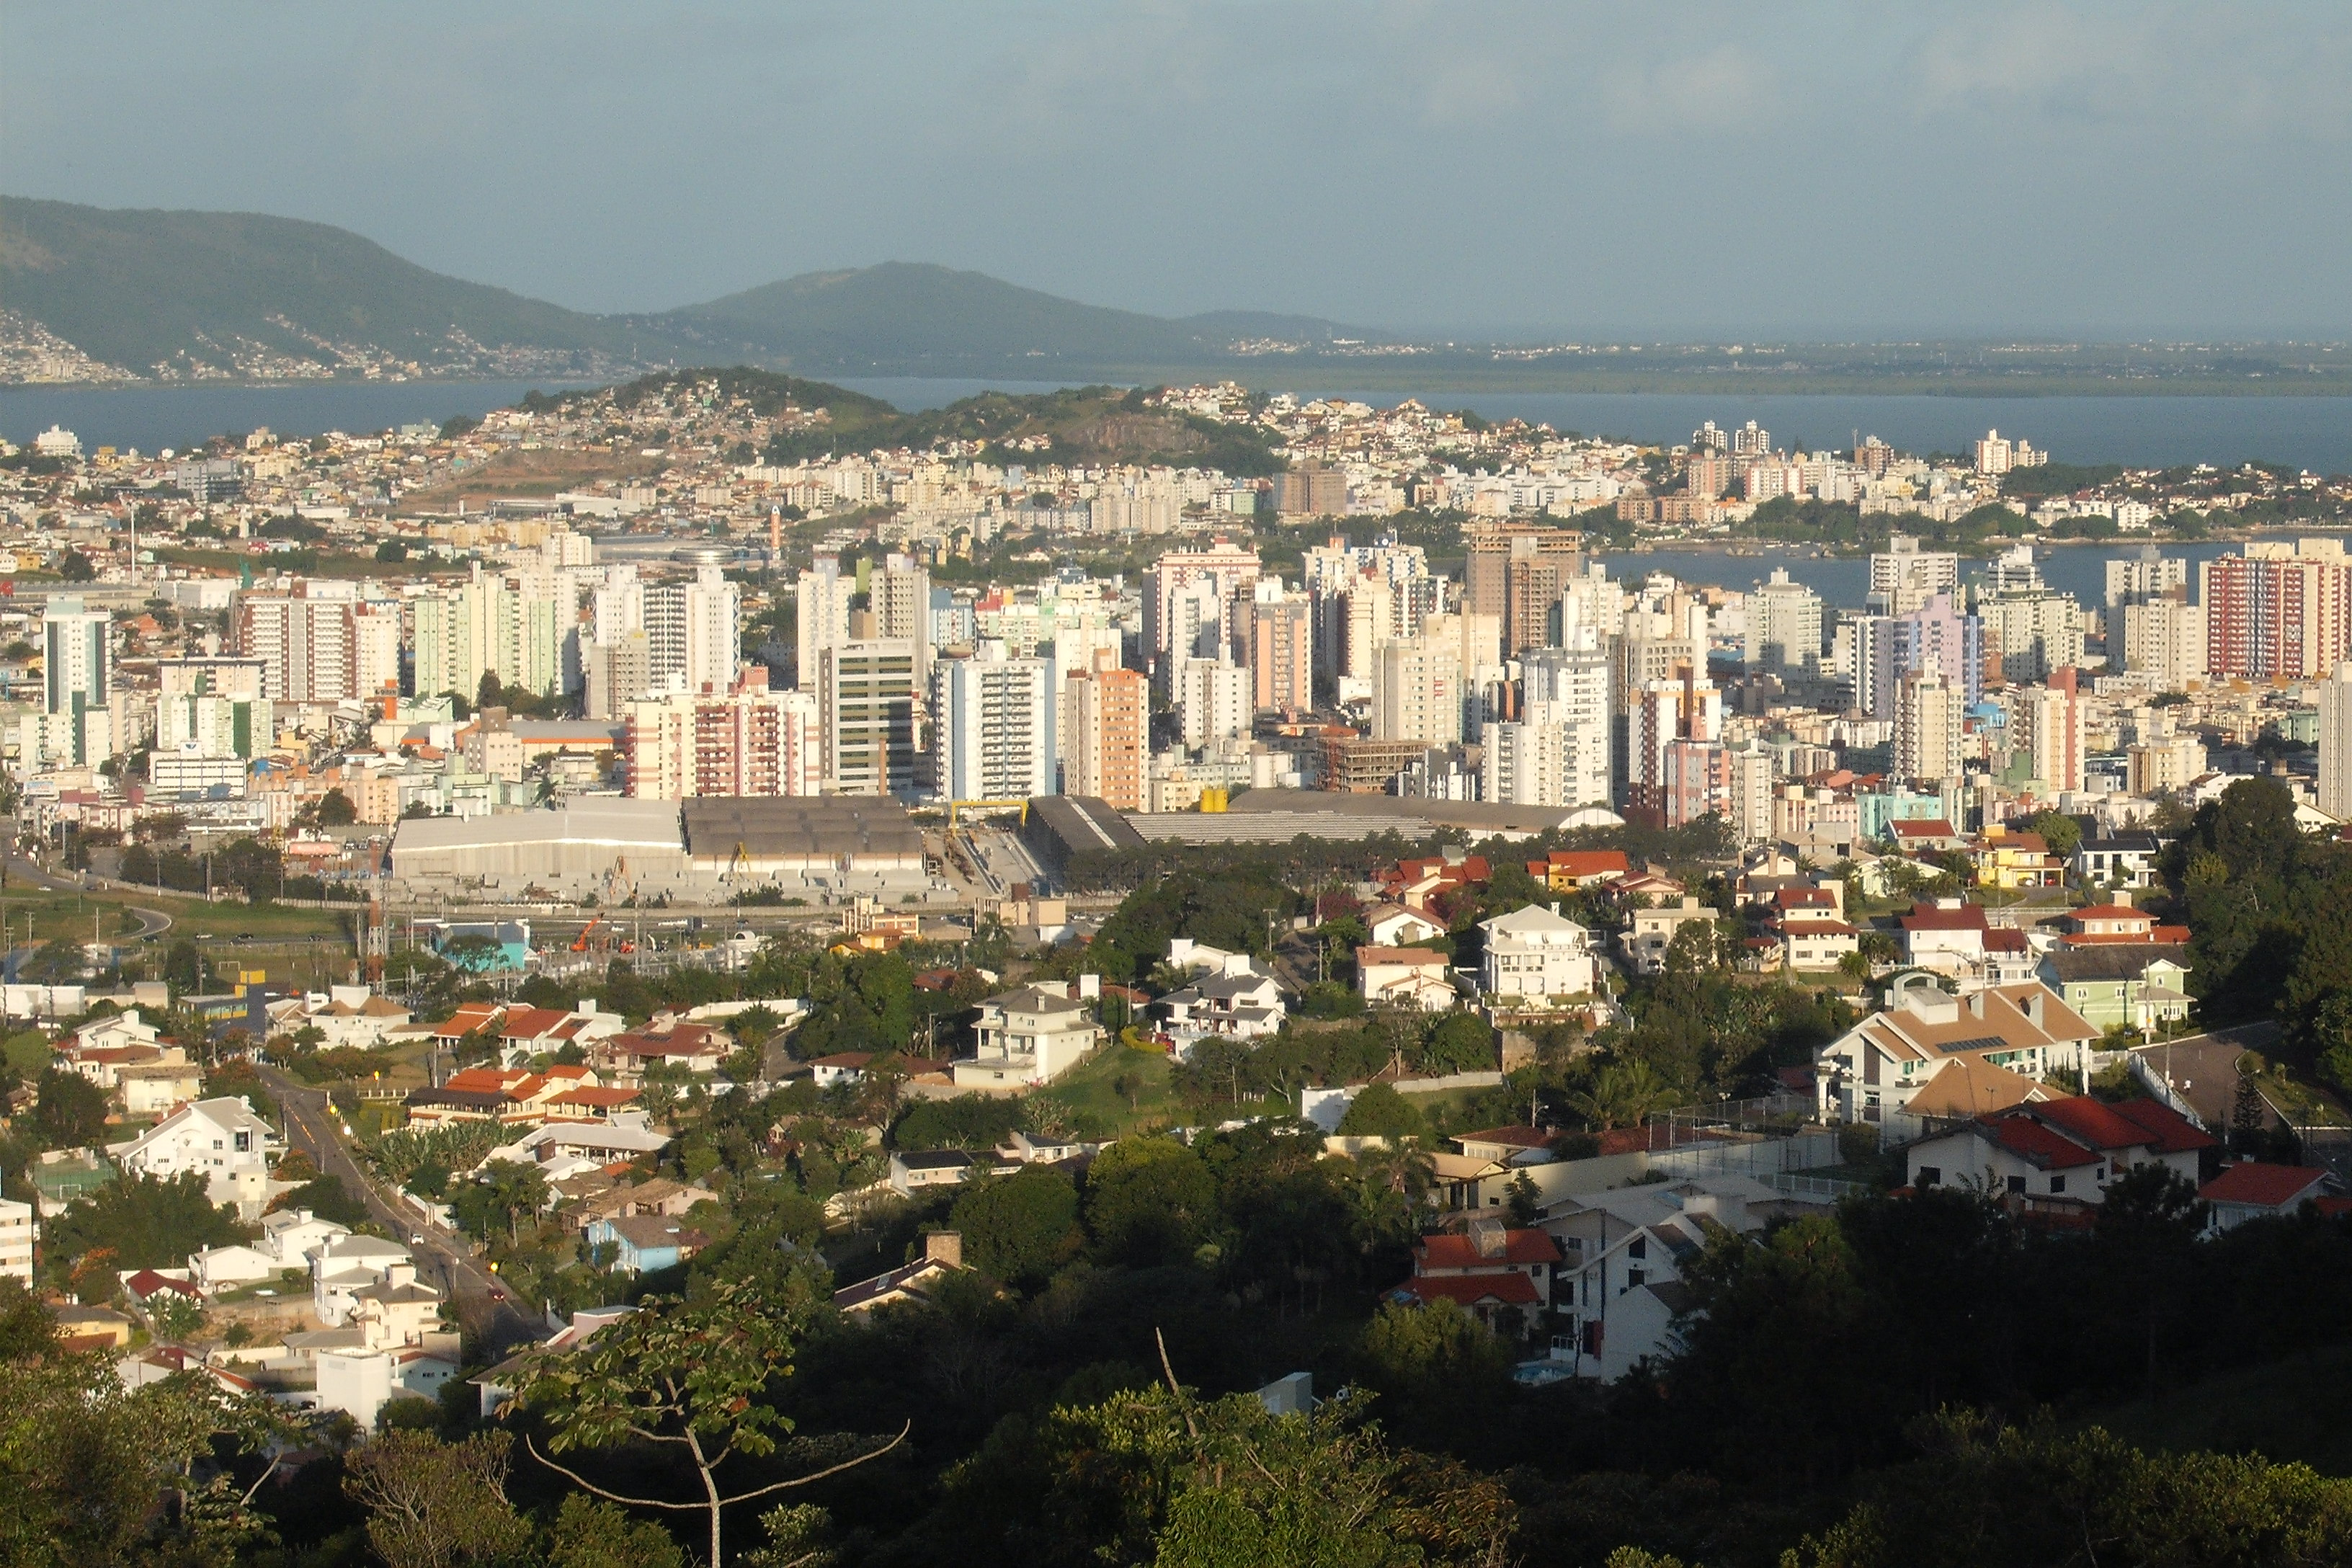 São José Santa Catarina fonte: upload.wikimedia.org